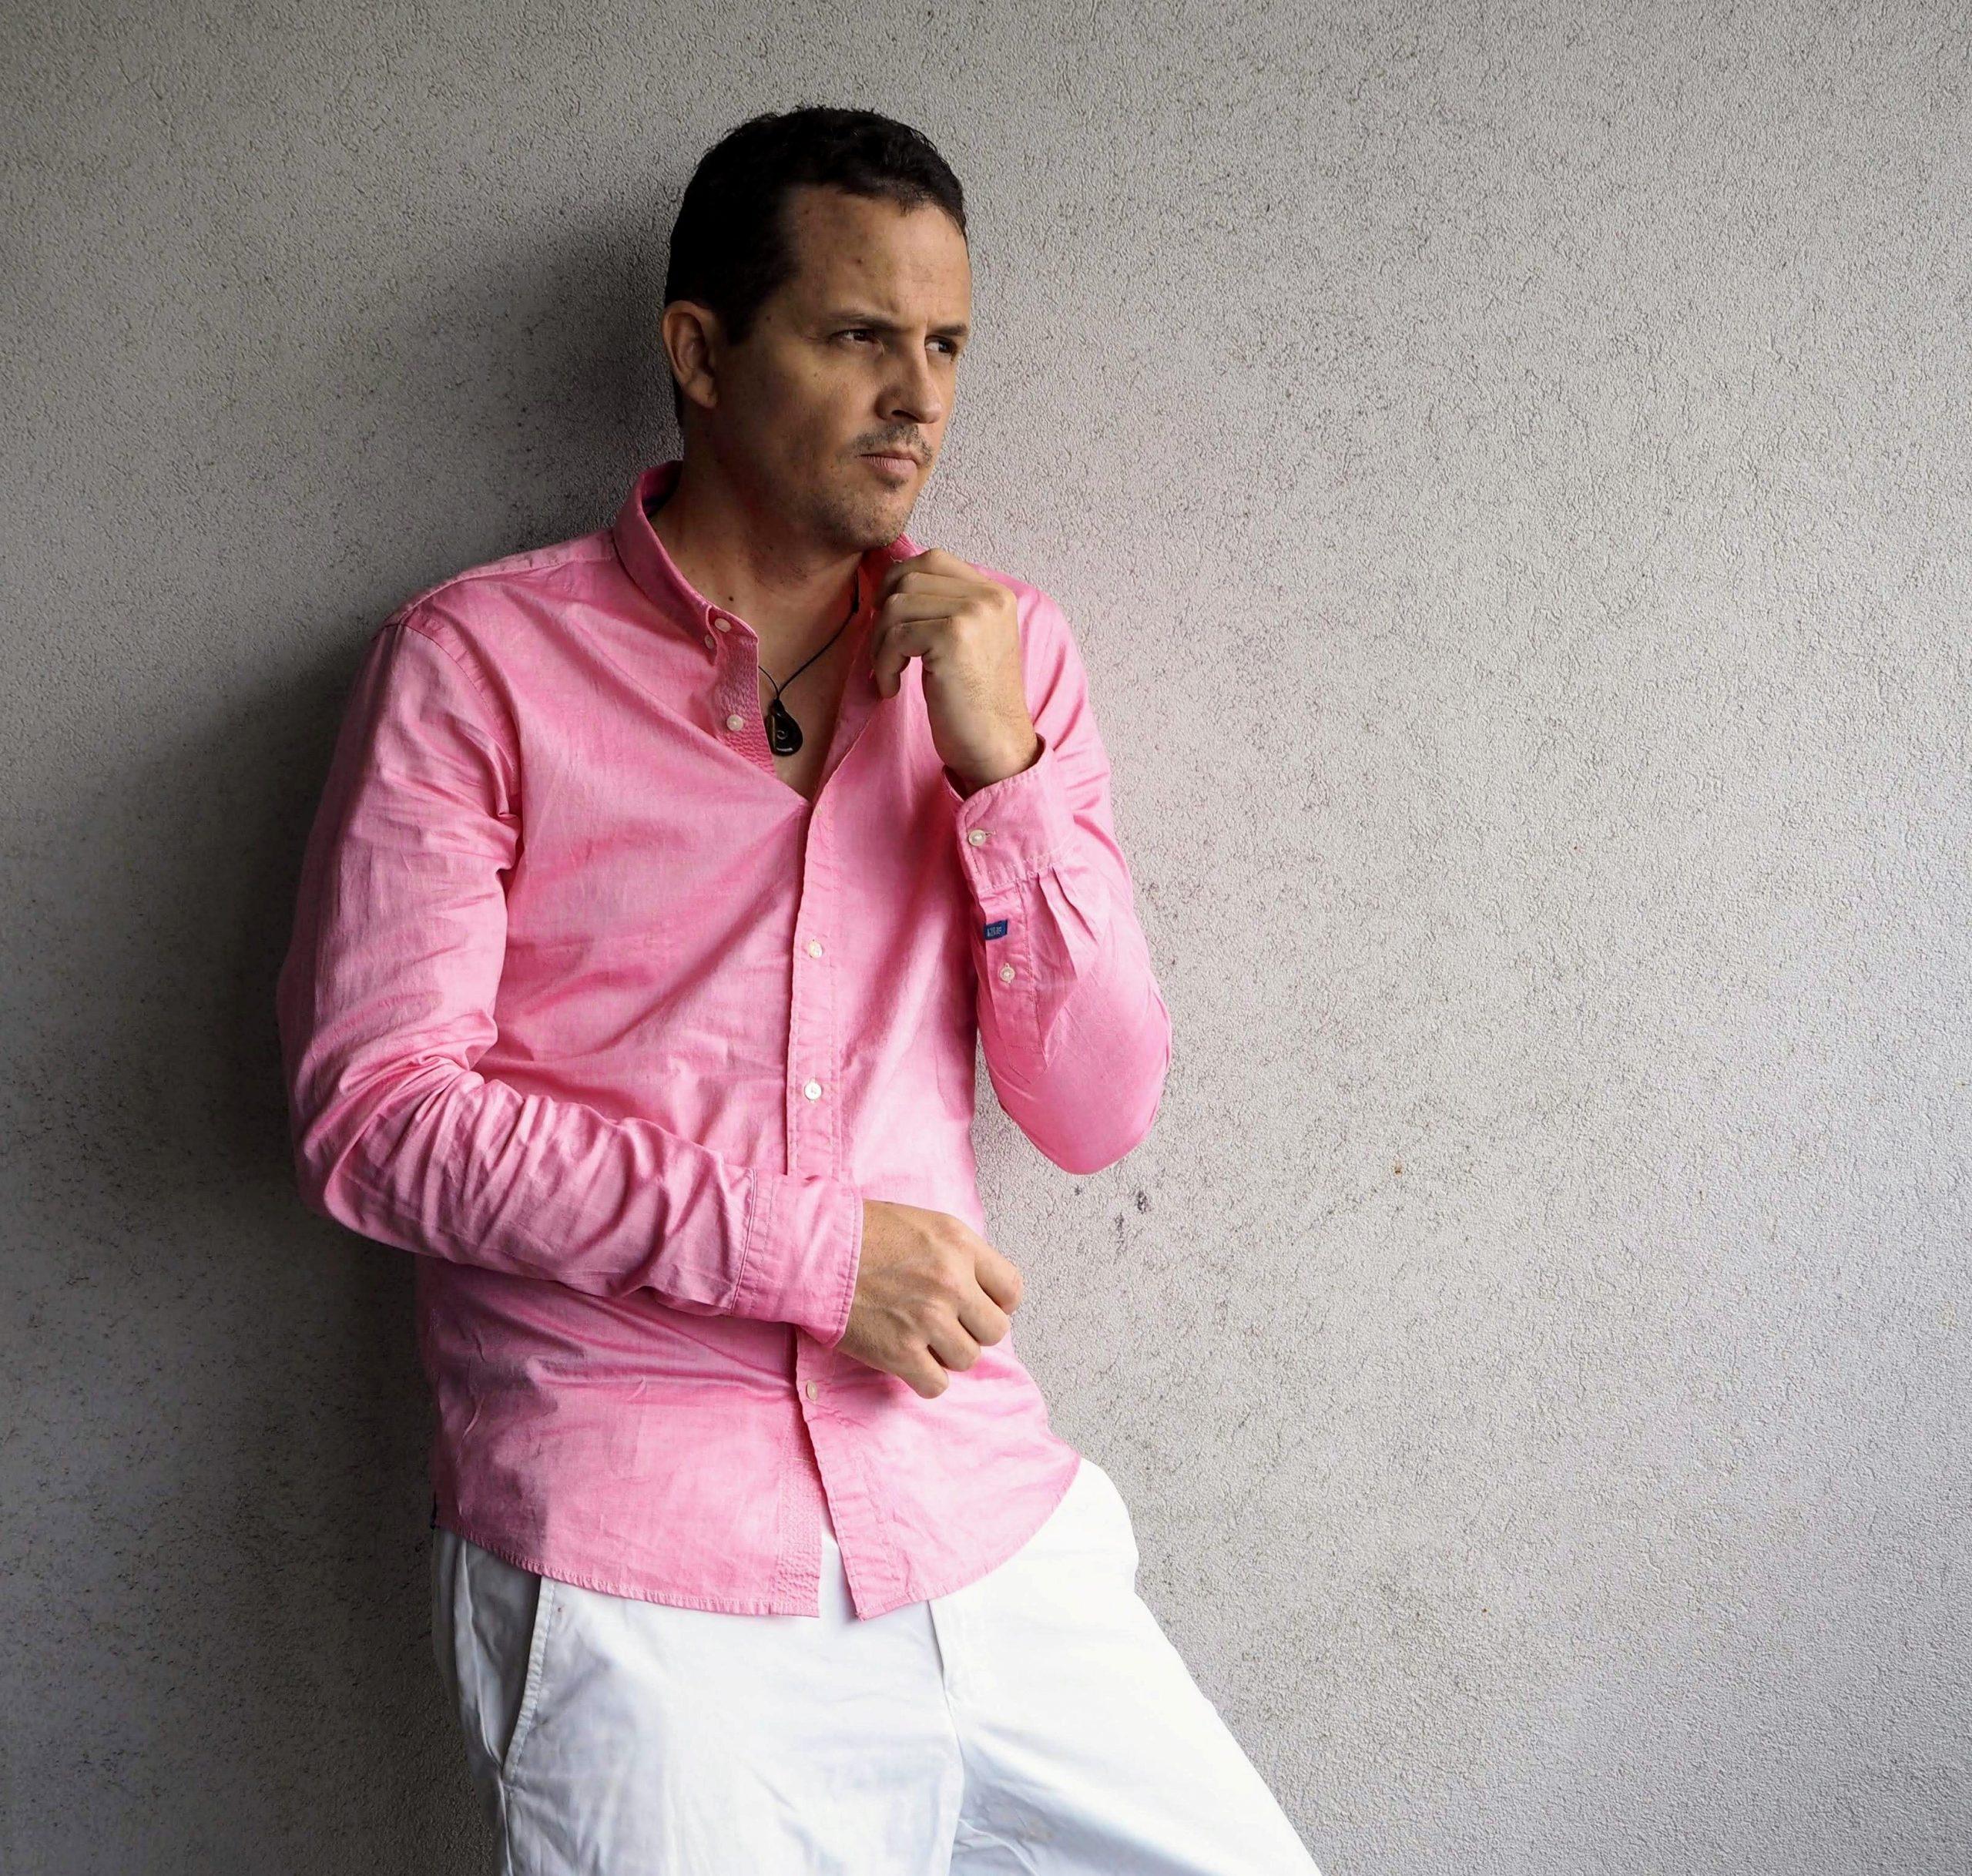 shop dress well dressed man fashion mens lifestyle blog masculine